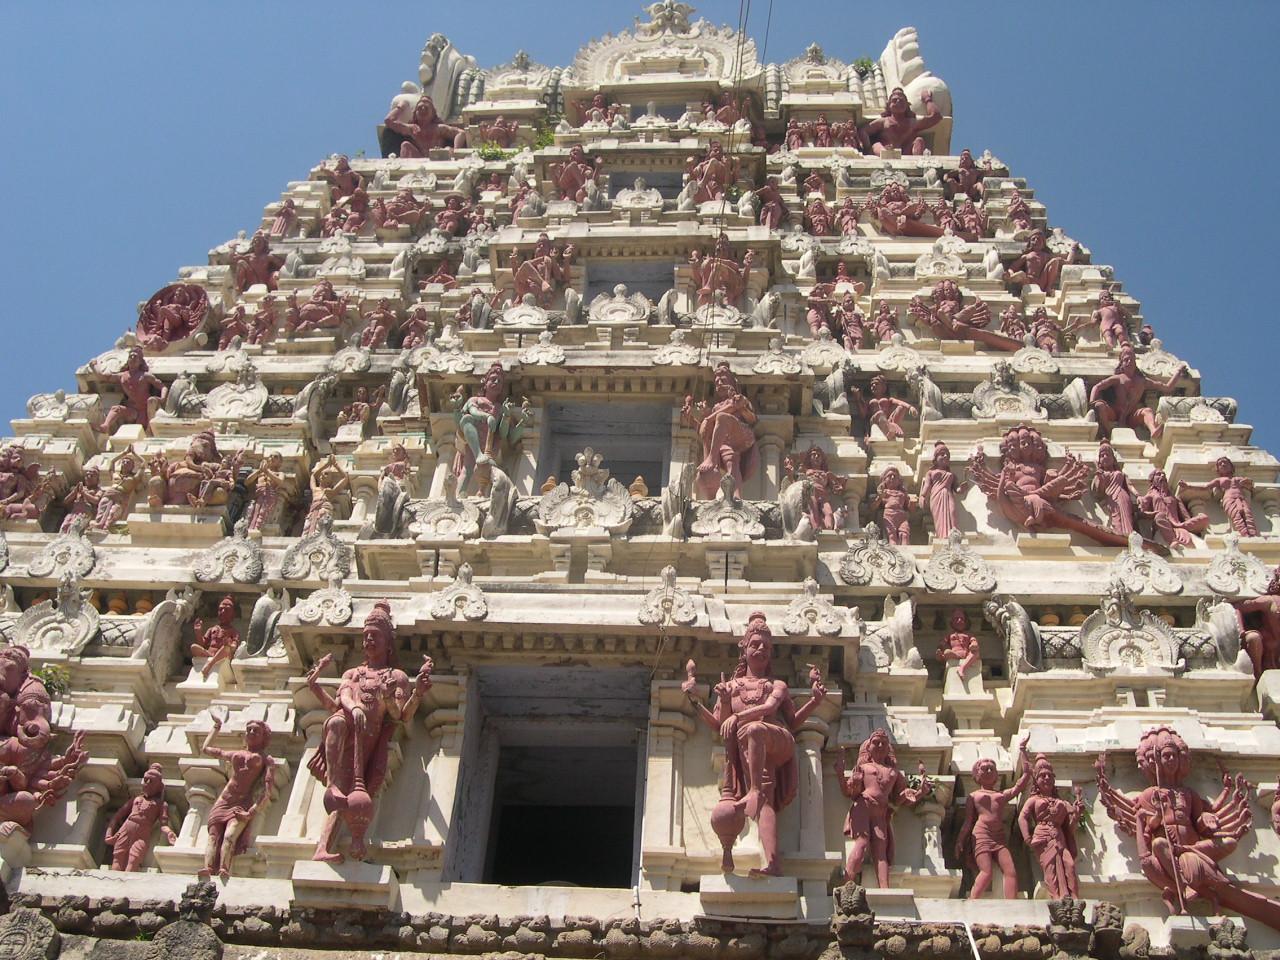 mission de volontariat humanitaire en inde temple